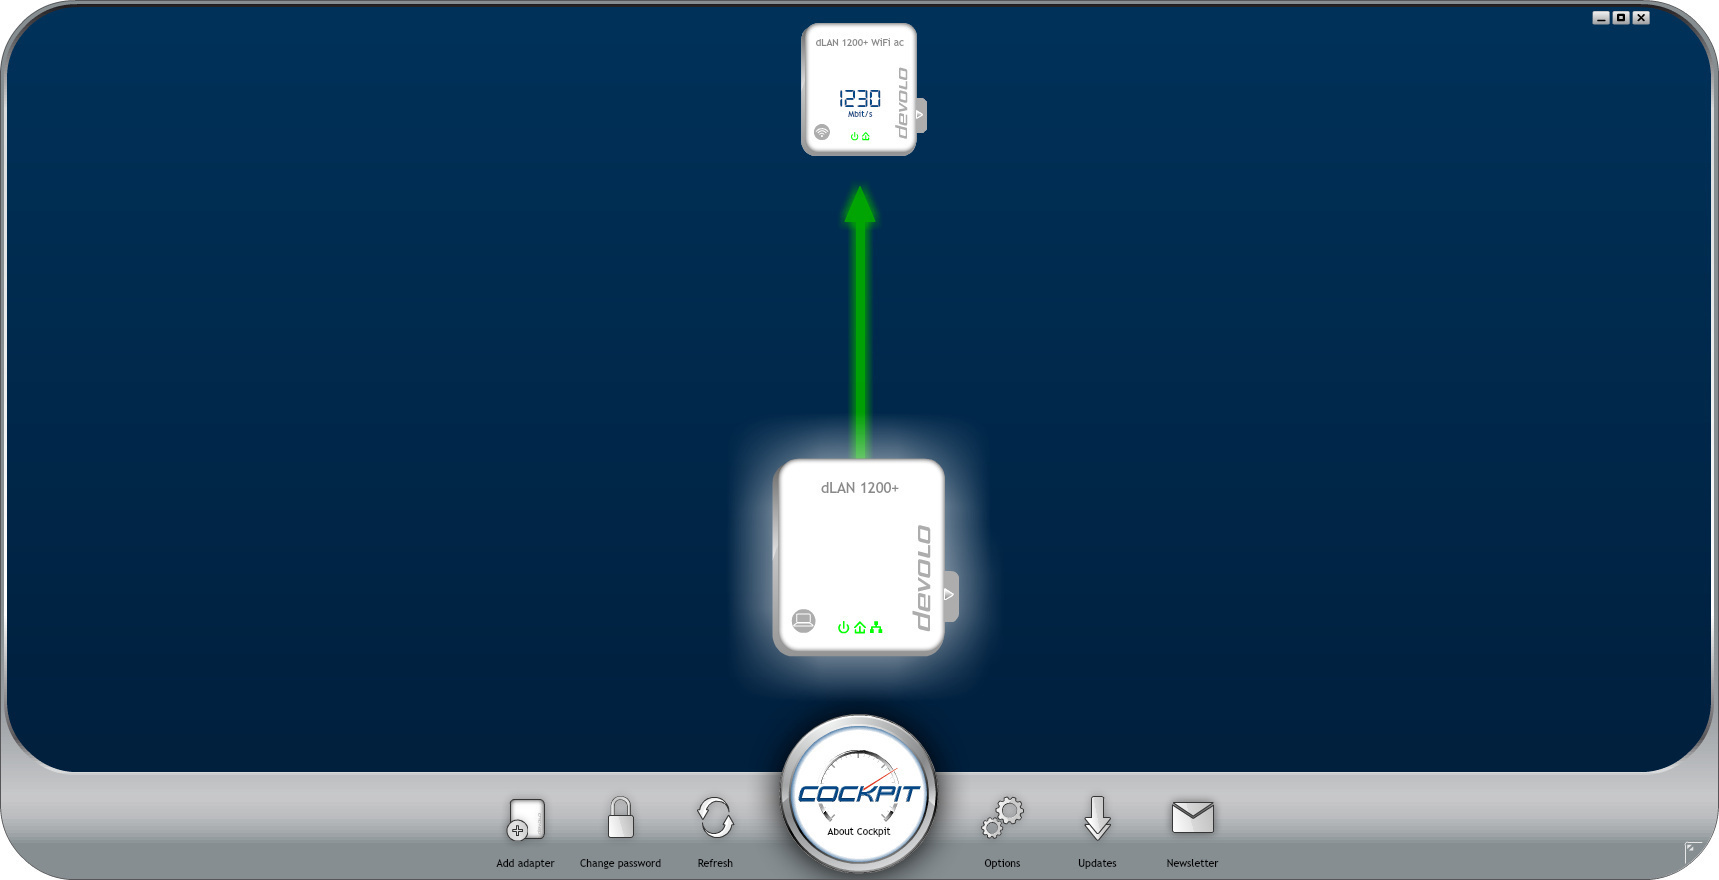 devolo dlan 1200 multiroom wifi kit review een compleet pakket software. Black Bedroom Furniture Sets. Home Design Ideas